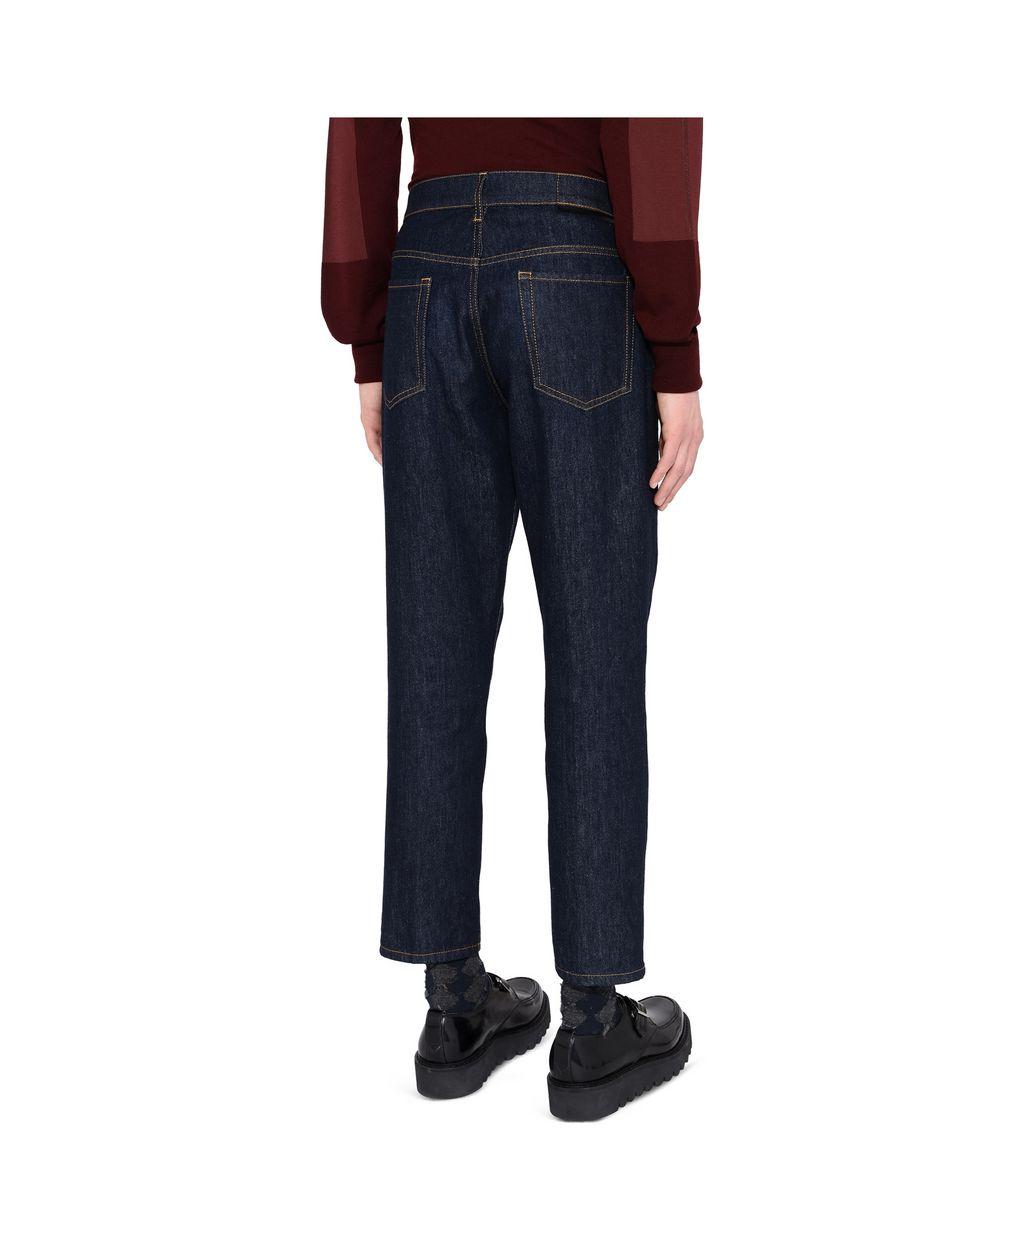 Dark Denzel Carrot Jeans - STELLA McCARTNEY MEN